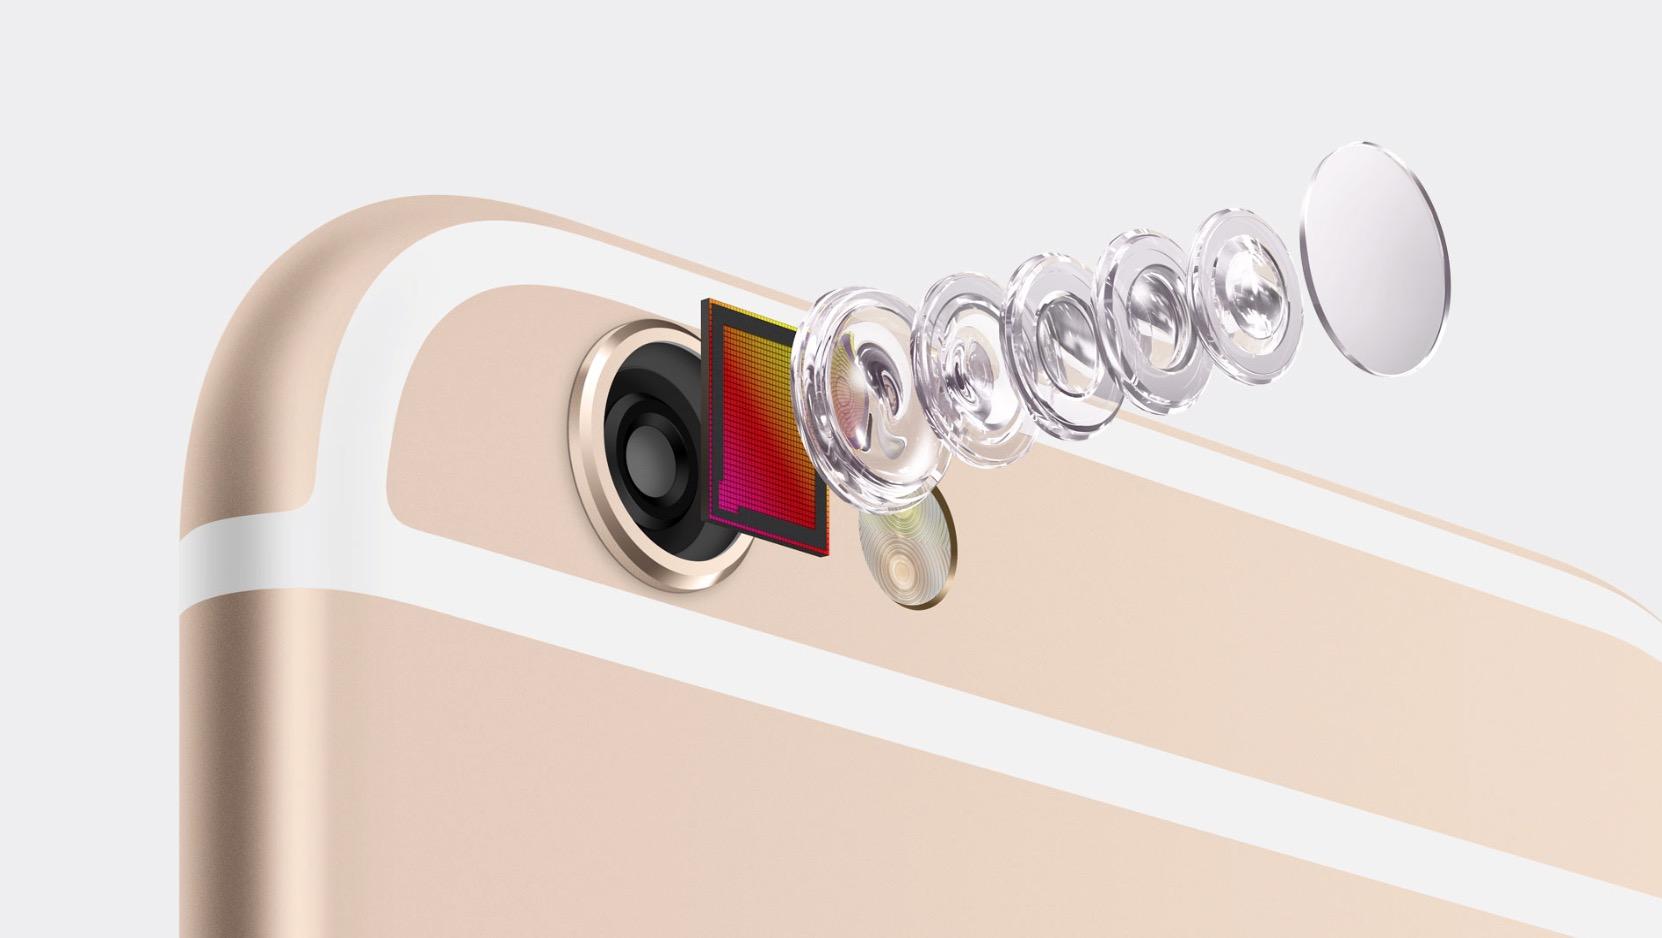 Iphone 6s plus phiên bản 2016